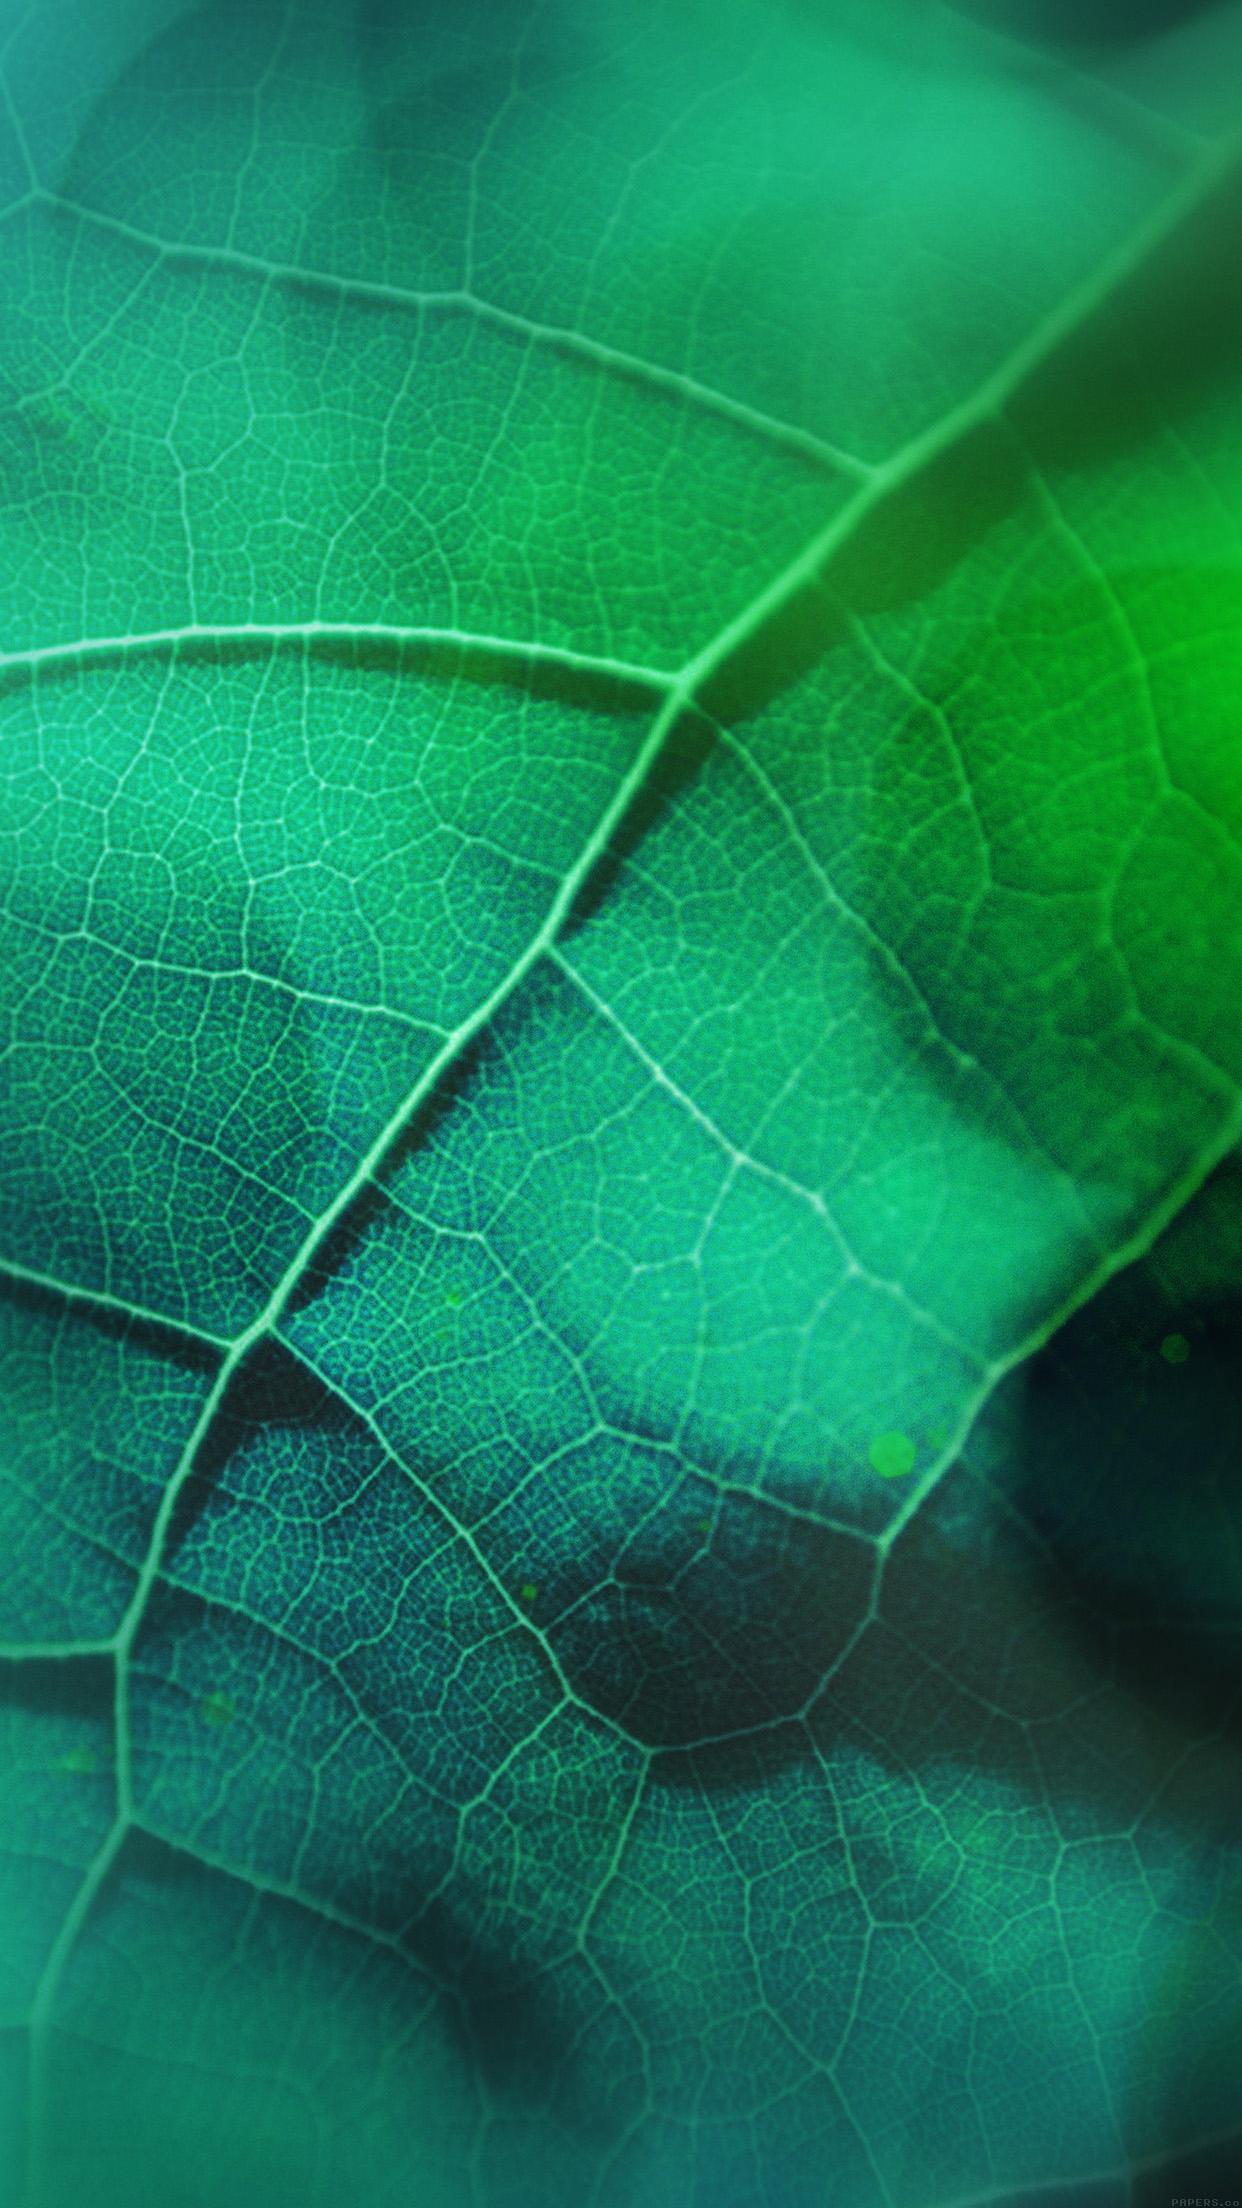 Good Wallpaper Love Green - Leaf-Flare-Nature-Green-Wood-Love-Pattern  Trends_5275.jpg